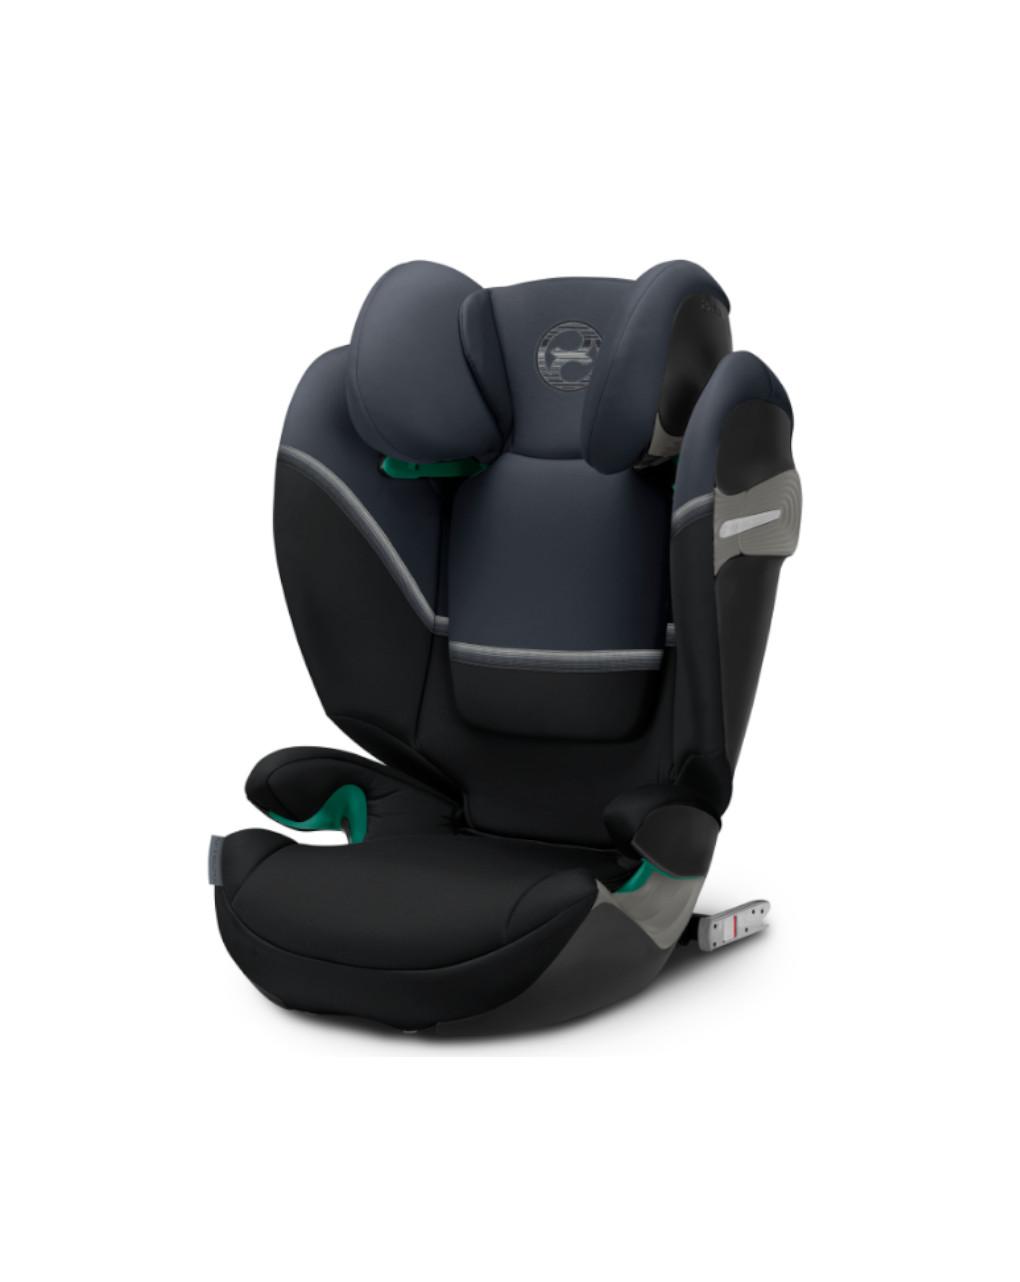 Cybex Κάθισμα Αυτοκινήτου Solution S i-Fix,Granite Black